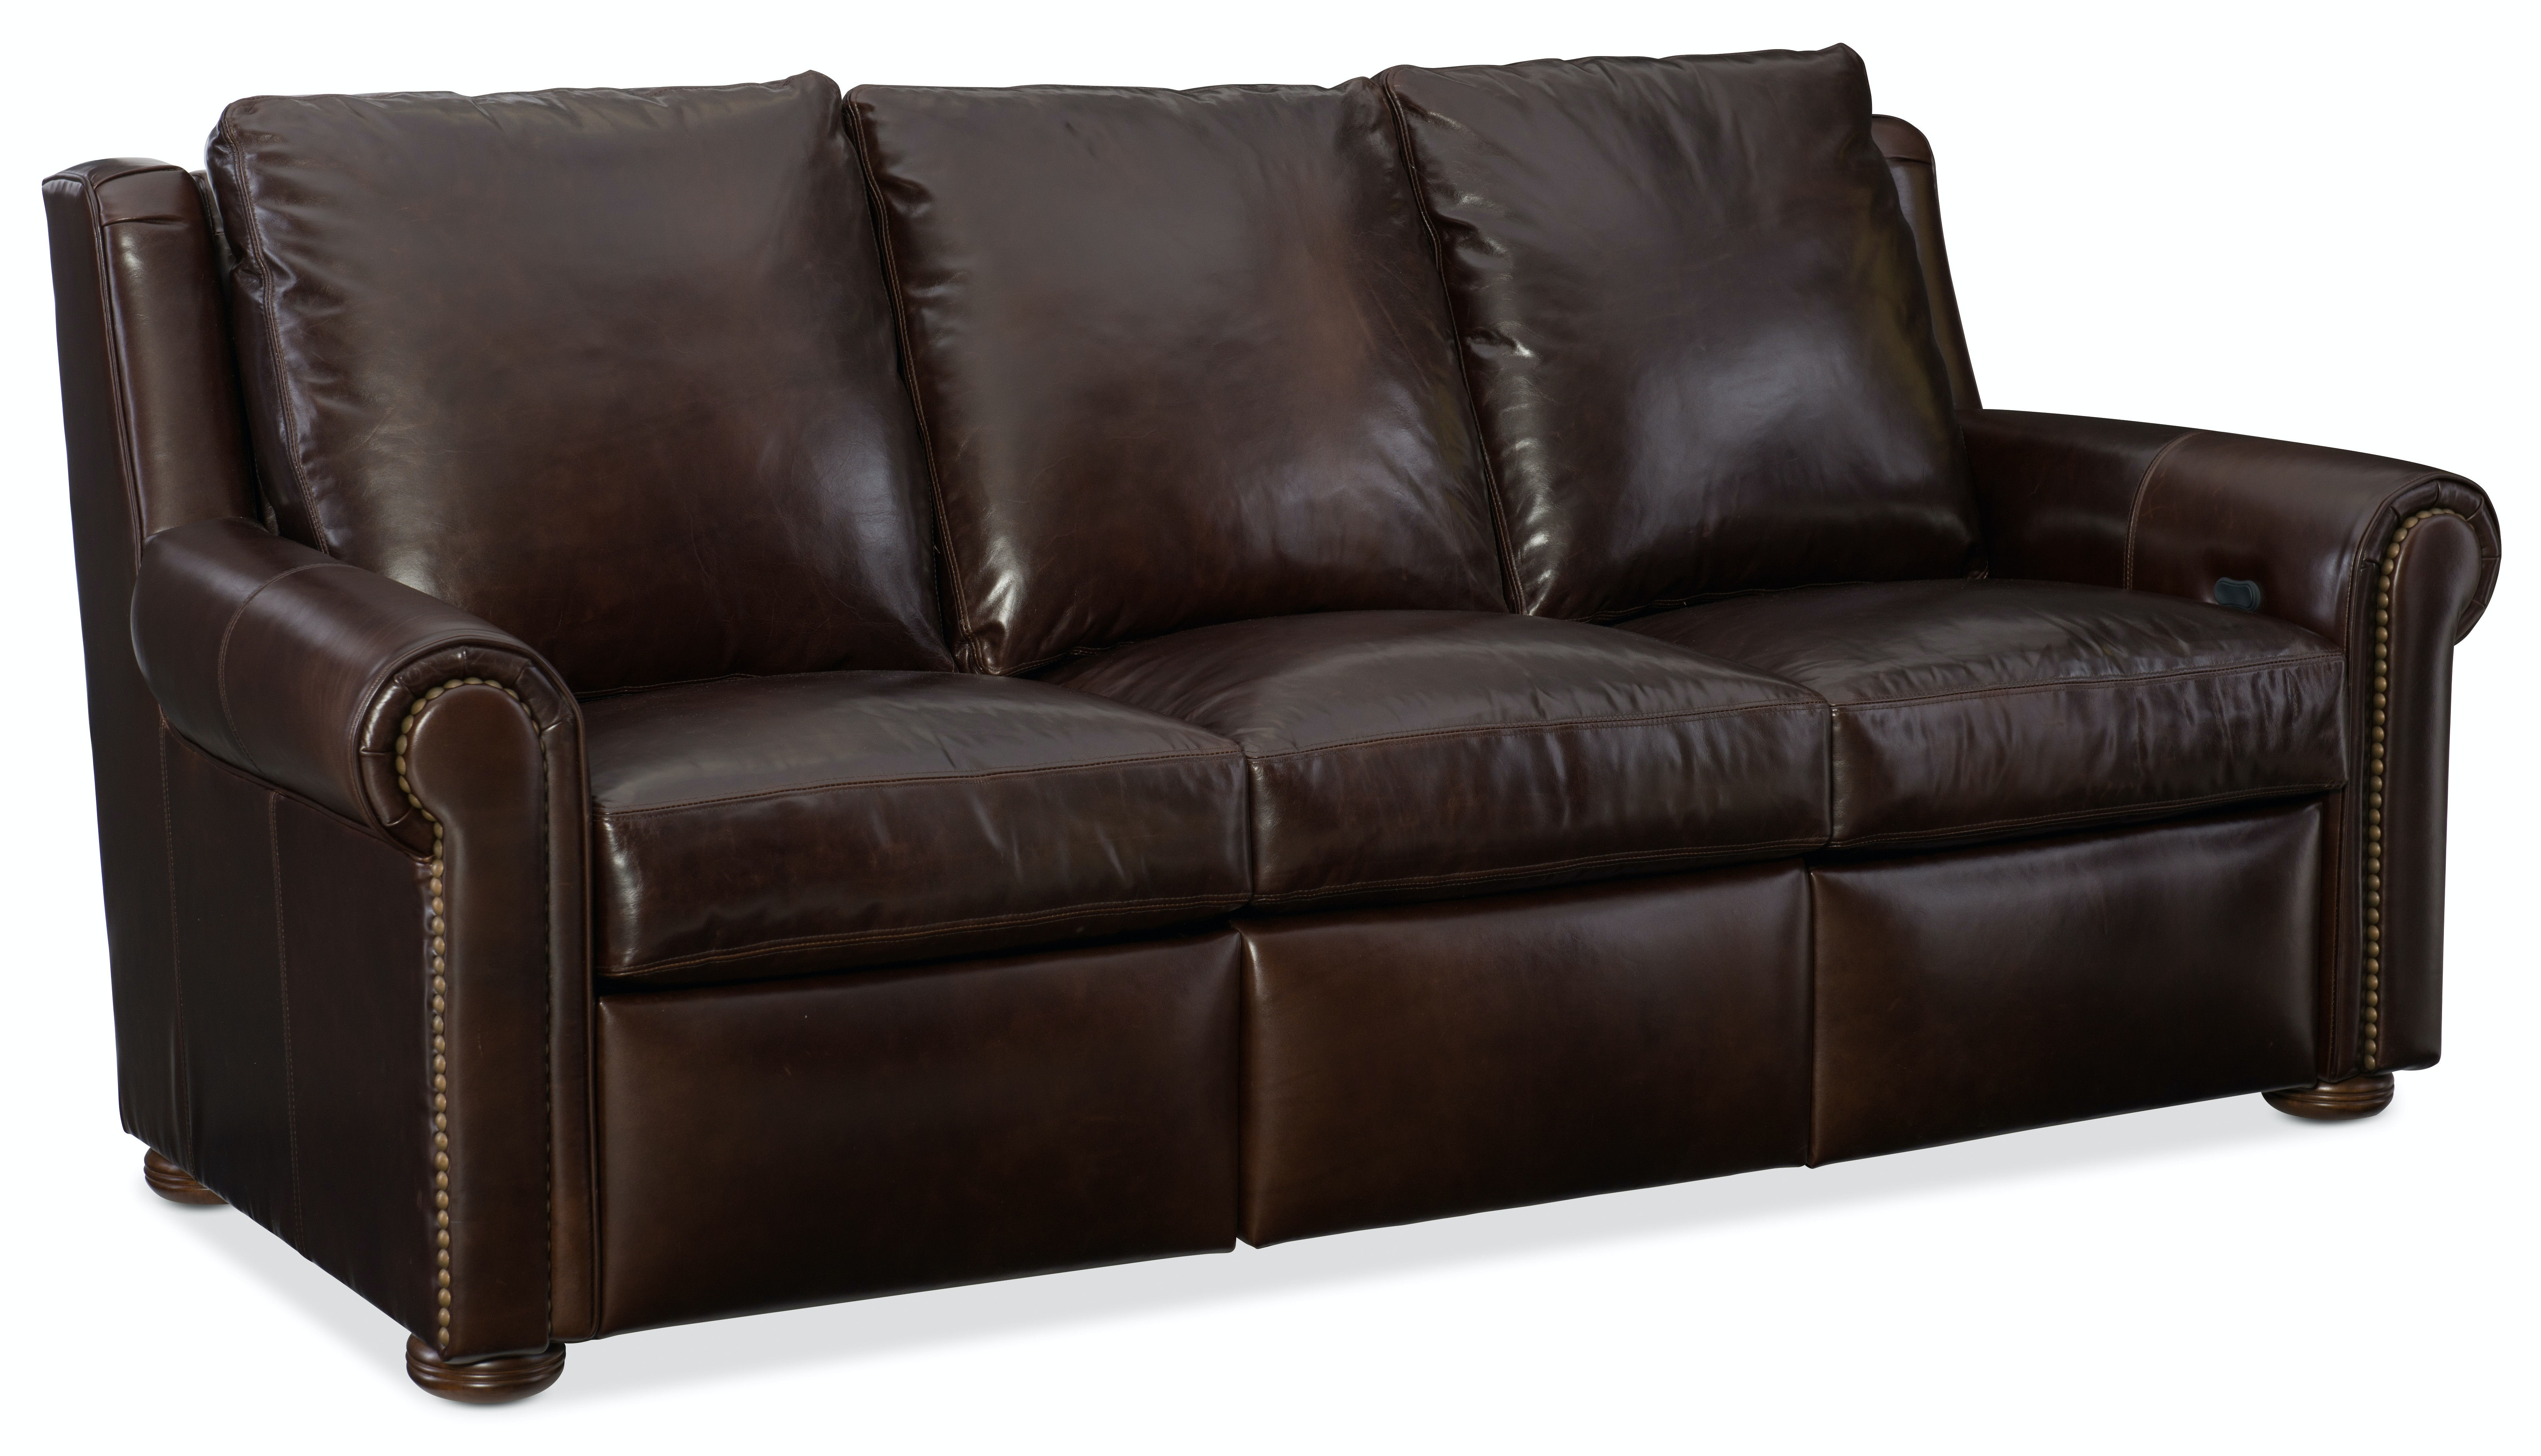 Bradington Young Living Room Whitaker Sofa Full Recline At Both